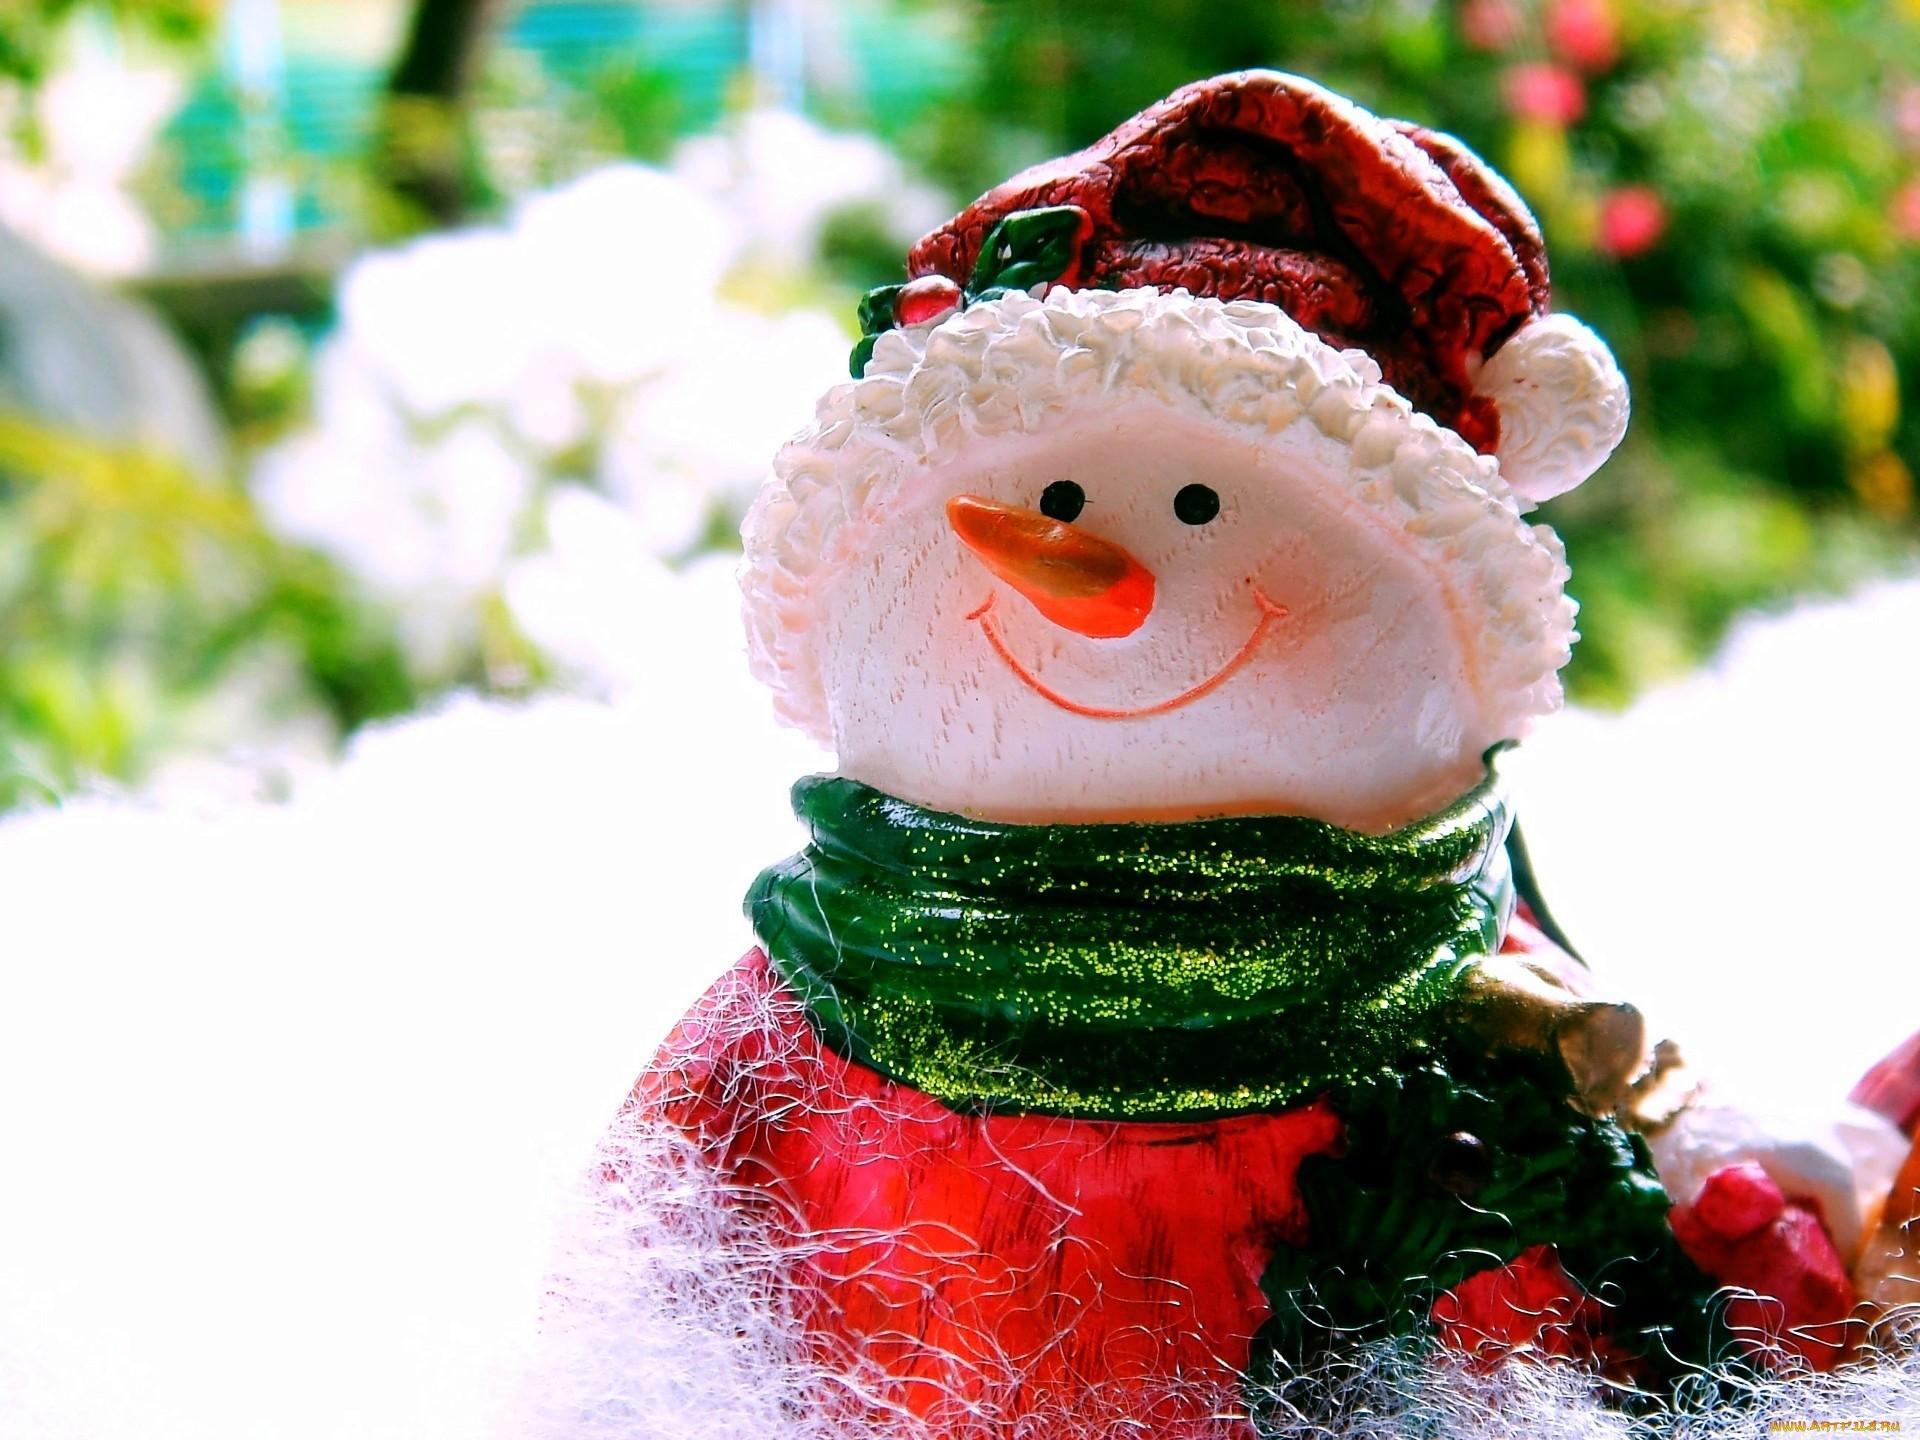 21304 скачать обои Зима, Фон, Игрушки, Снеговики - заставки и картинки бесплатно